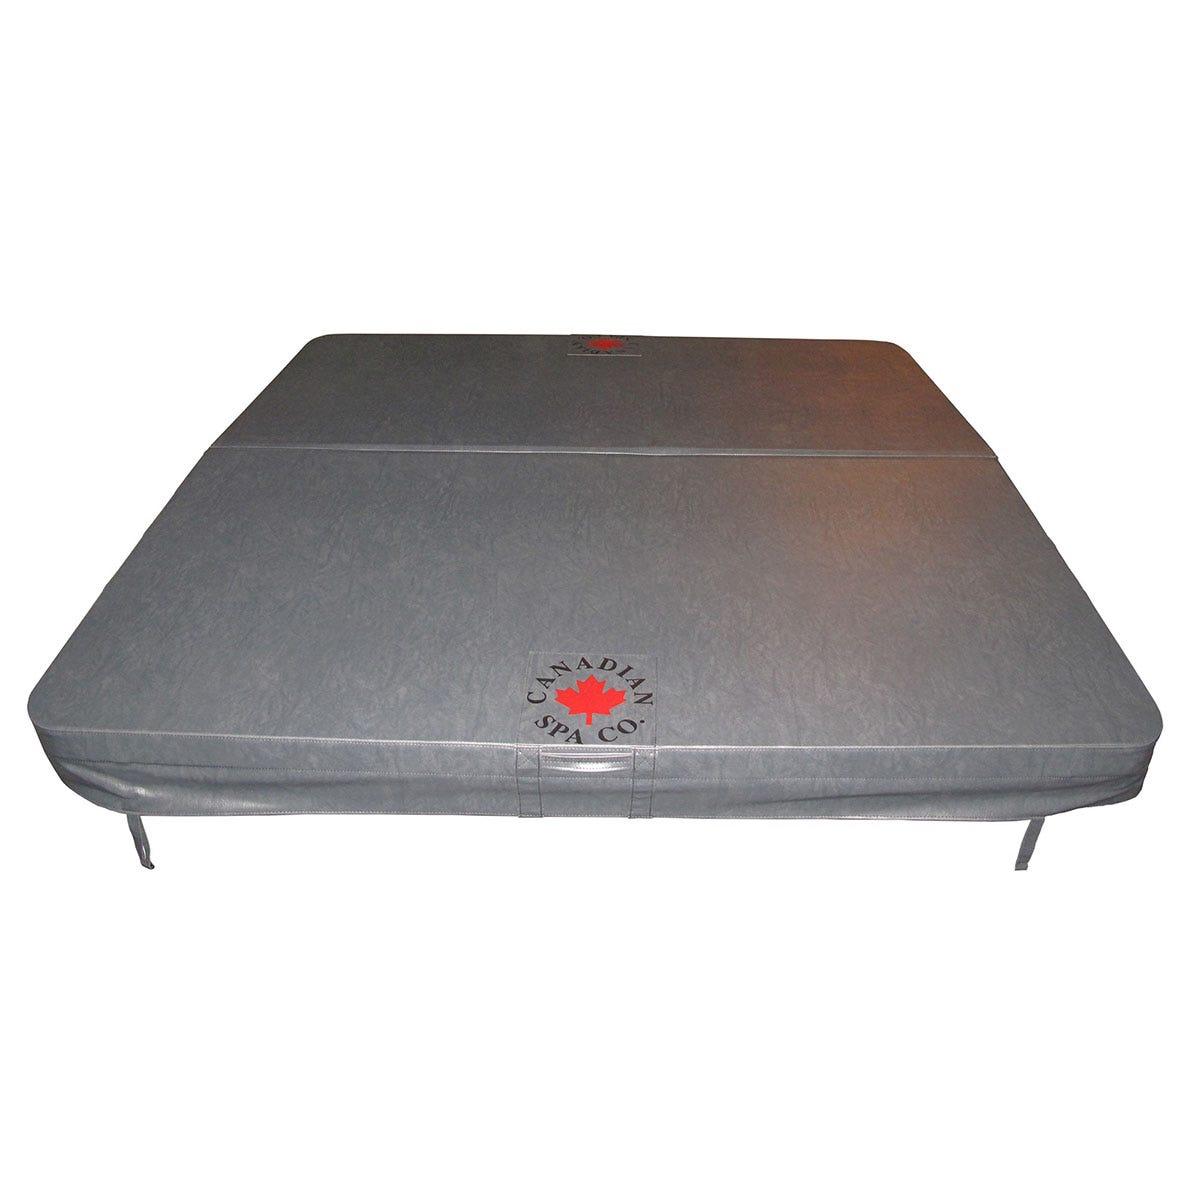 Canadian Spa Hot Tub Cover - Grey 198cm